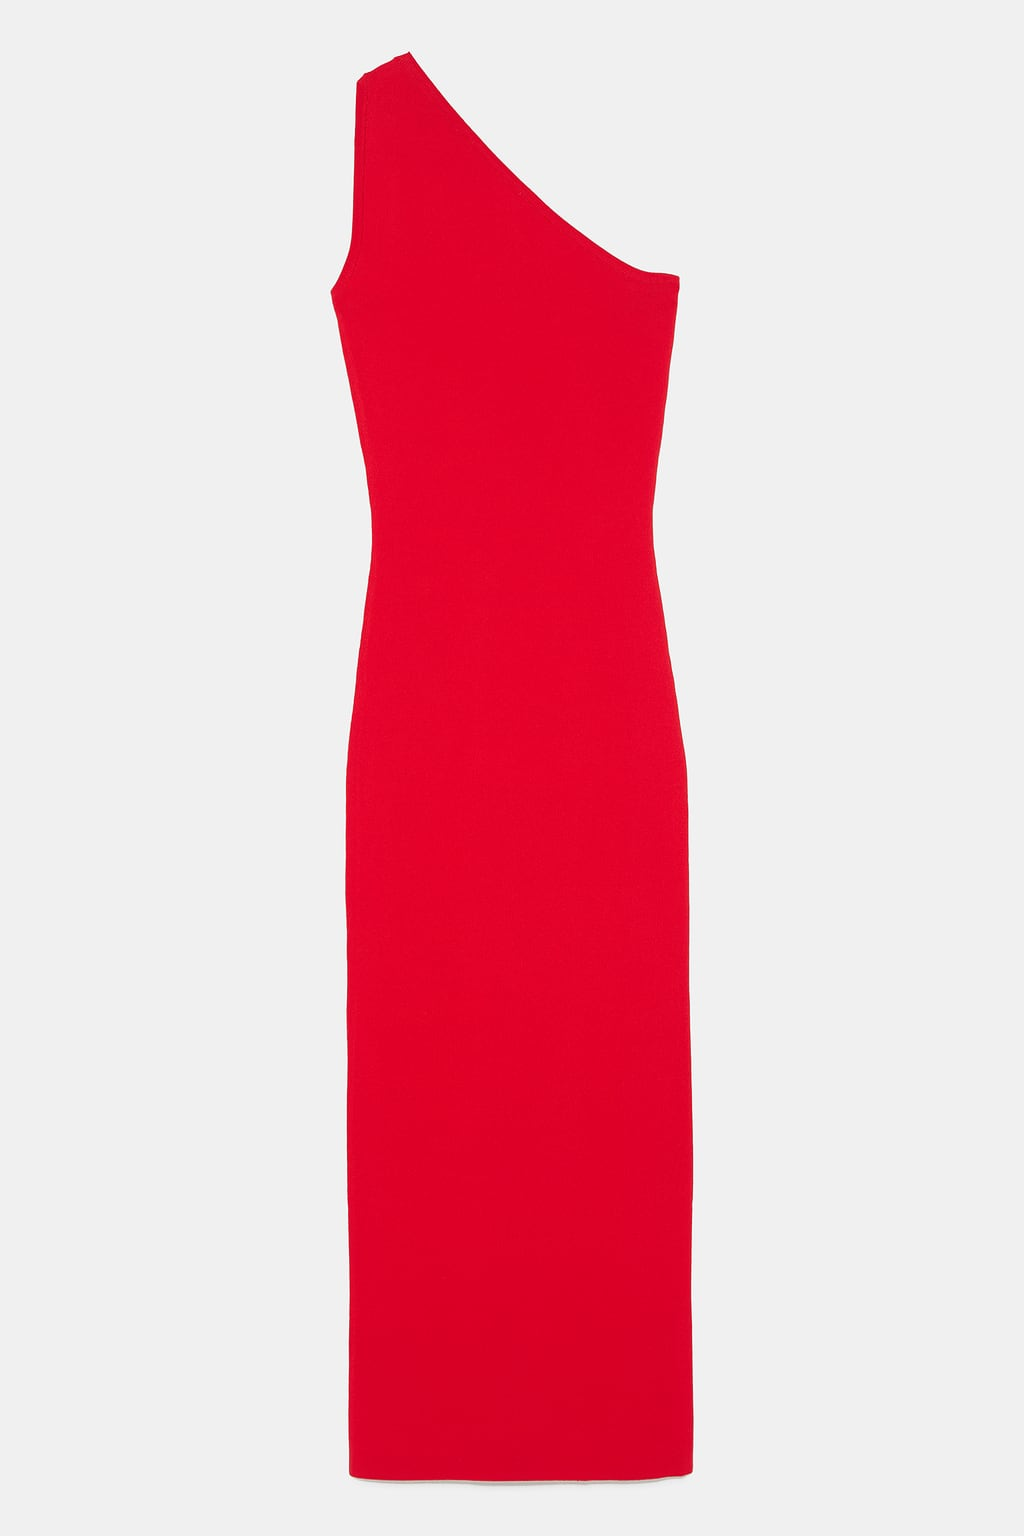 Emrata se viste con un vestido súper ajustado de Zara